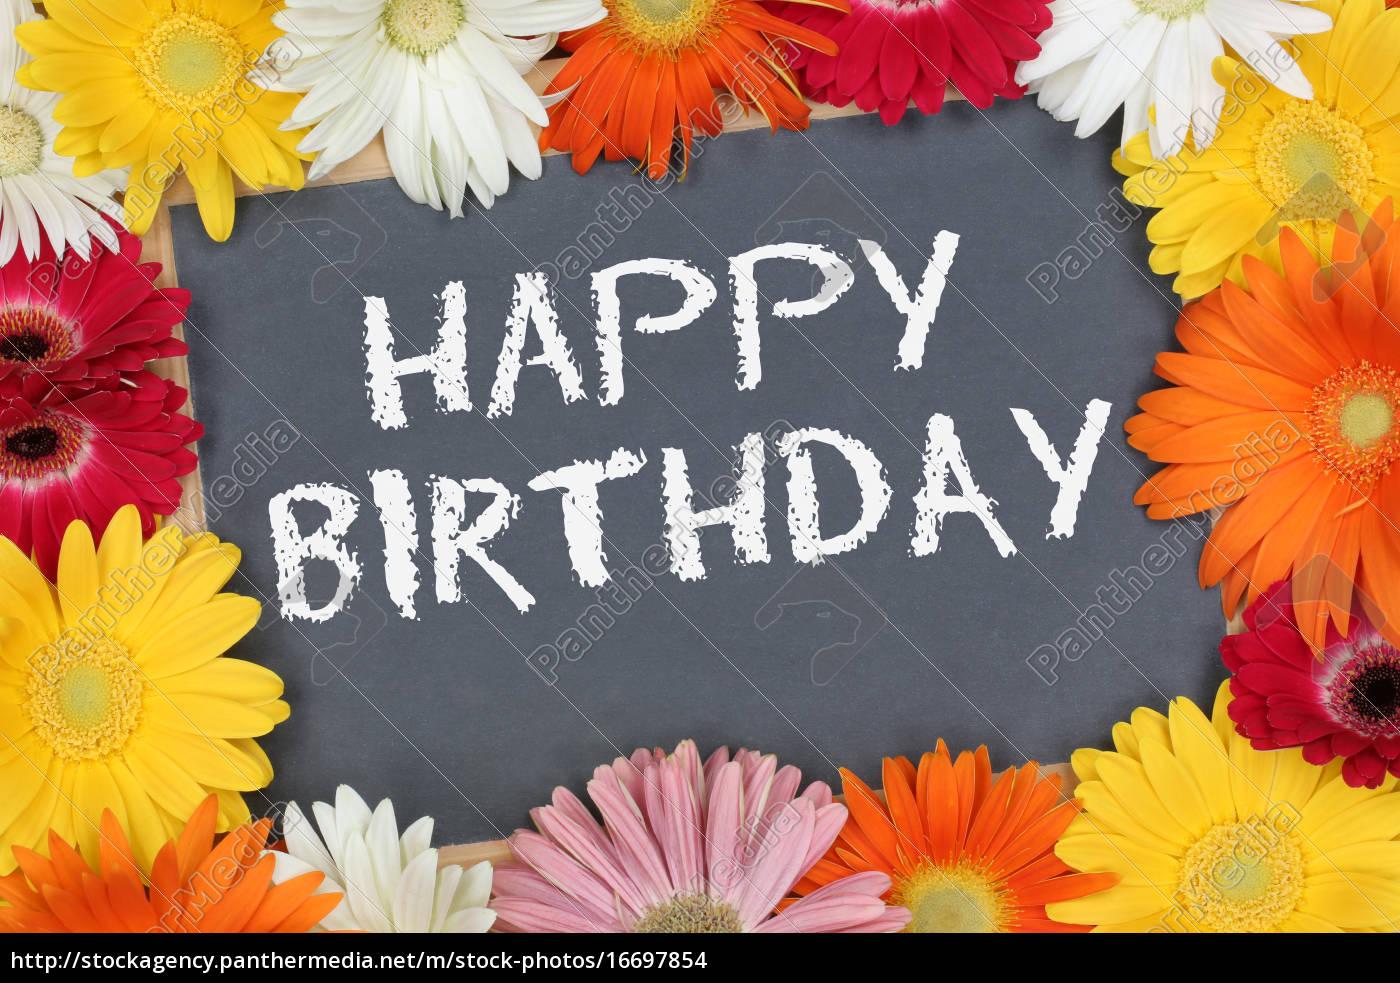 Geburtstagswünsche Karte Geburtstag.Stock Bild 16697854 Happy Birthday Geburtstag Karte Geburtstagskarte Mit Bunten